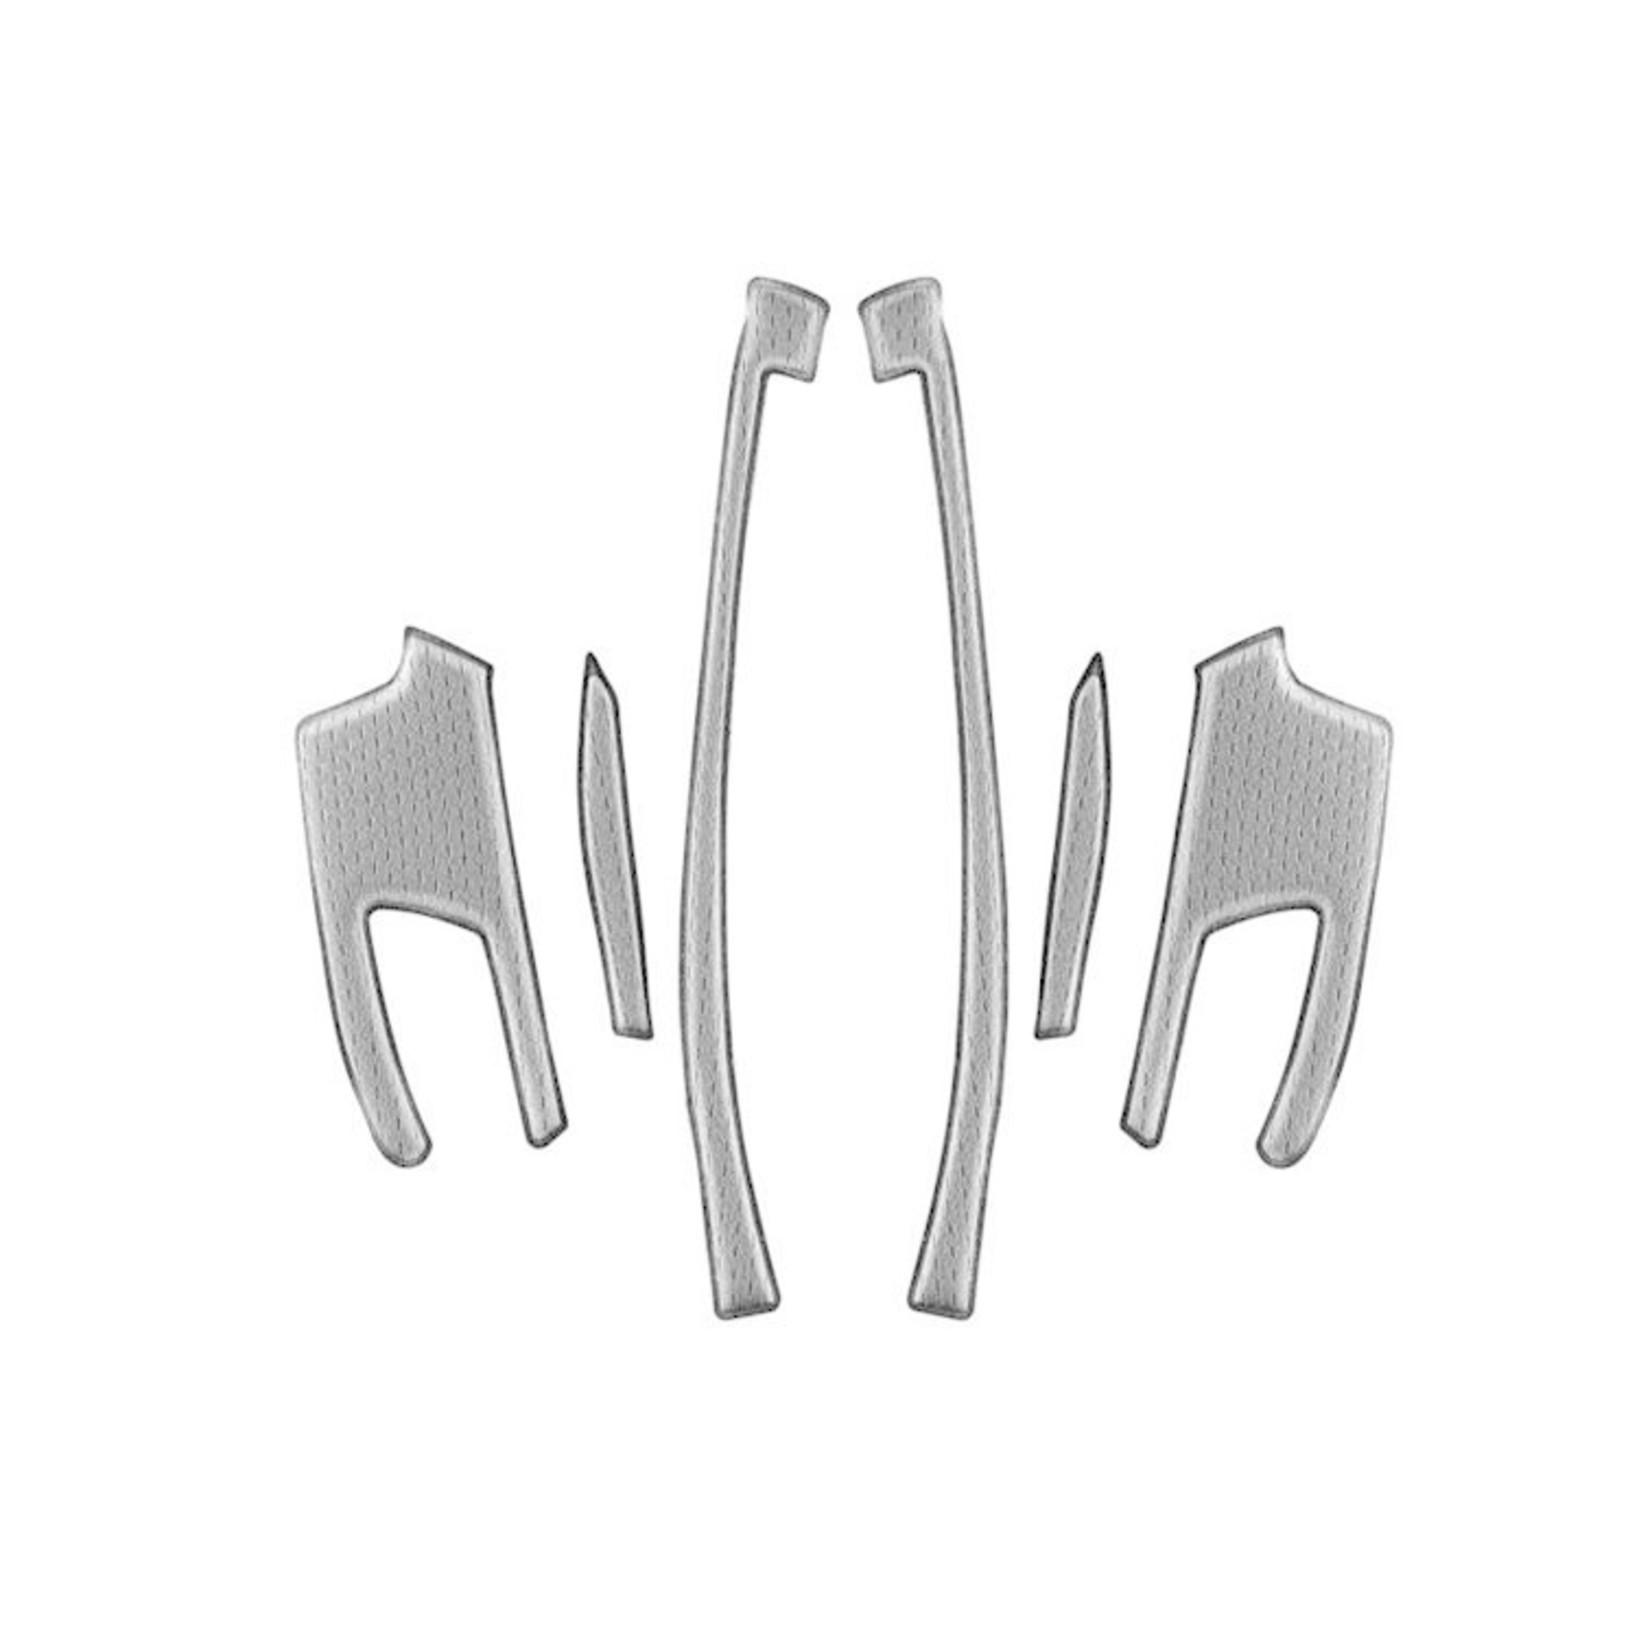 Giant Rail / Infinita Helmet Pad Set